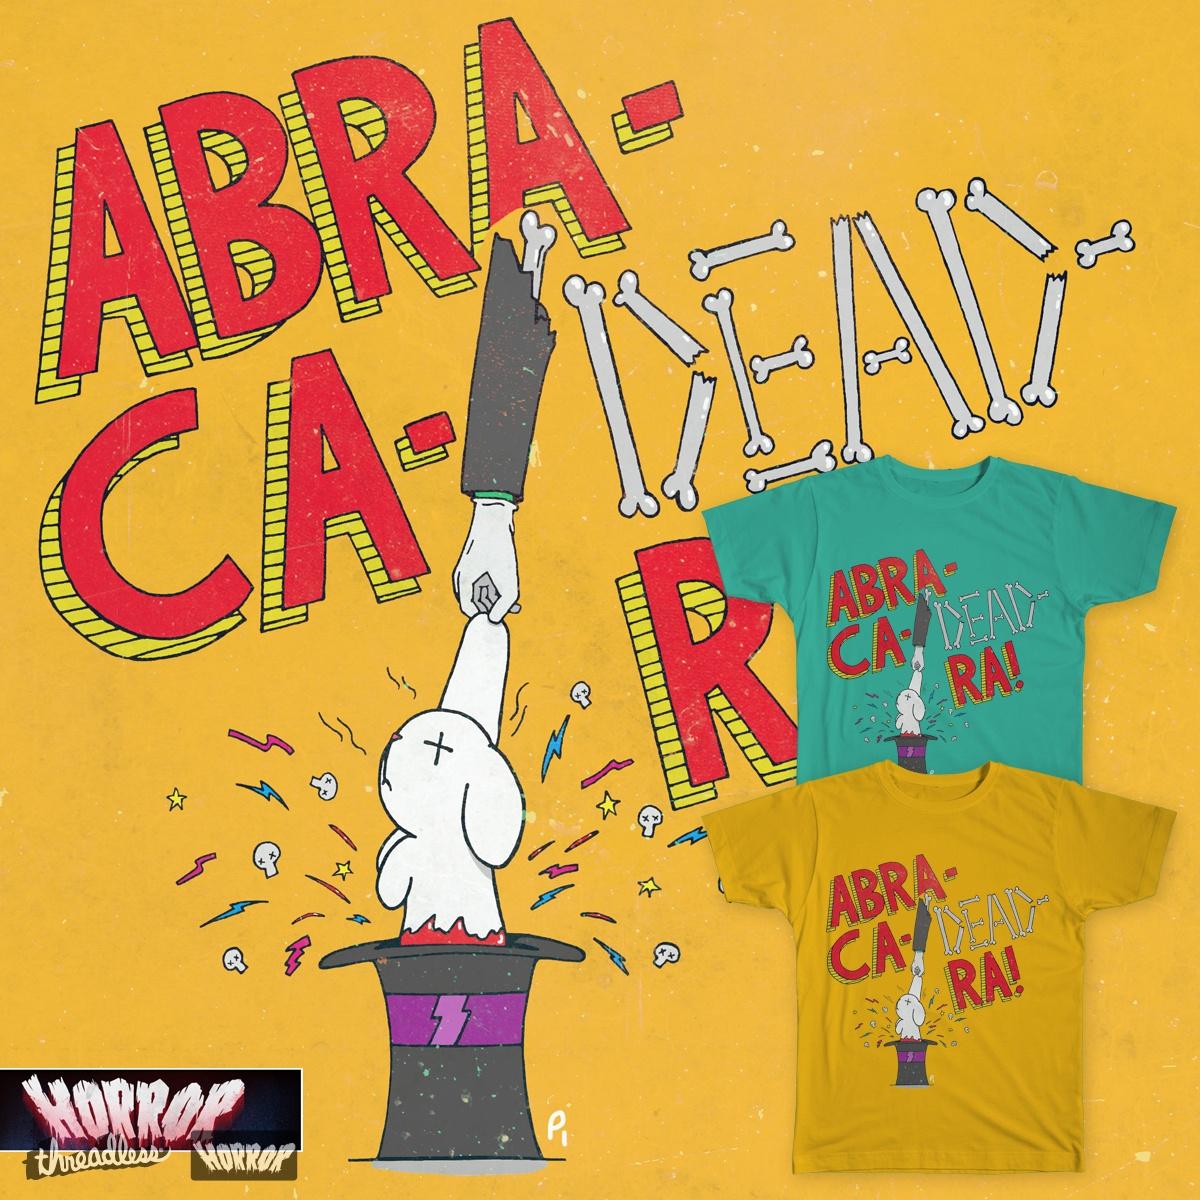 Abra-Ca-Dead-Ra! by MoonlitToast on Threadless